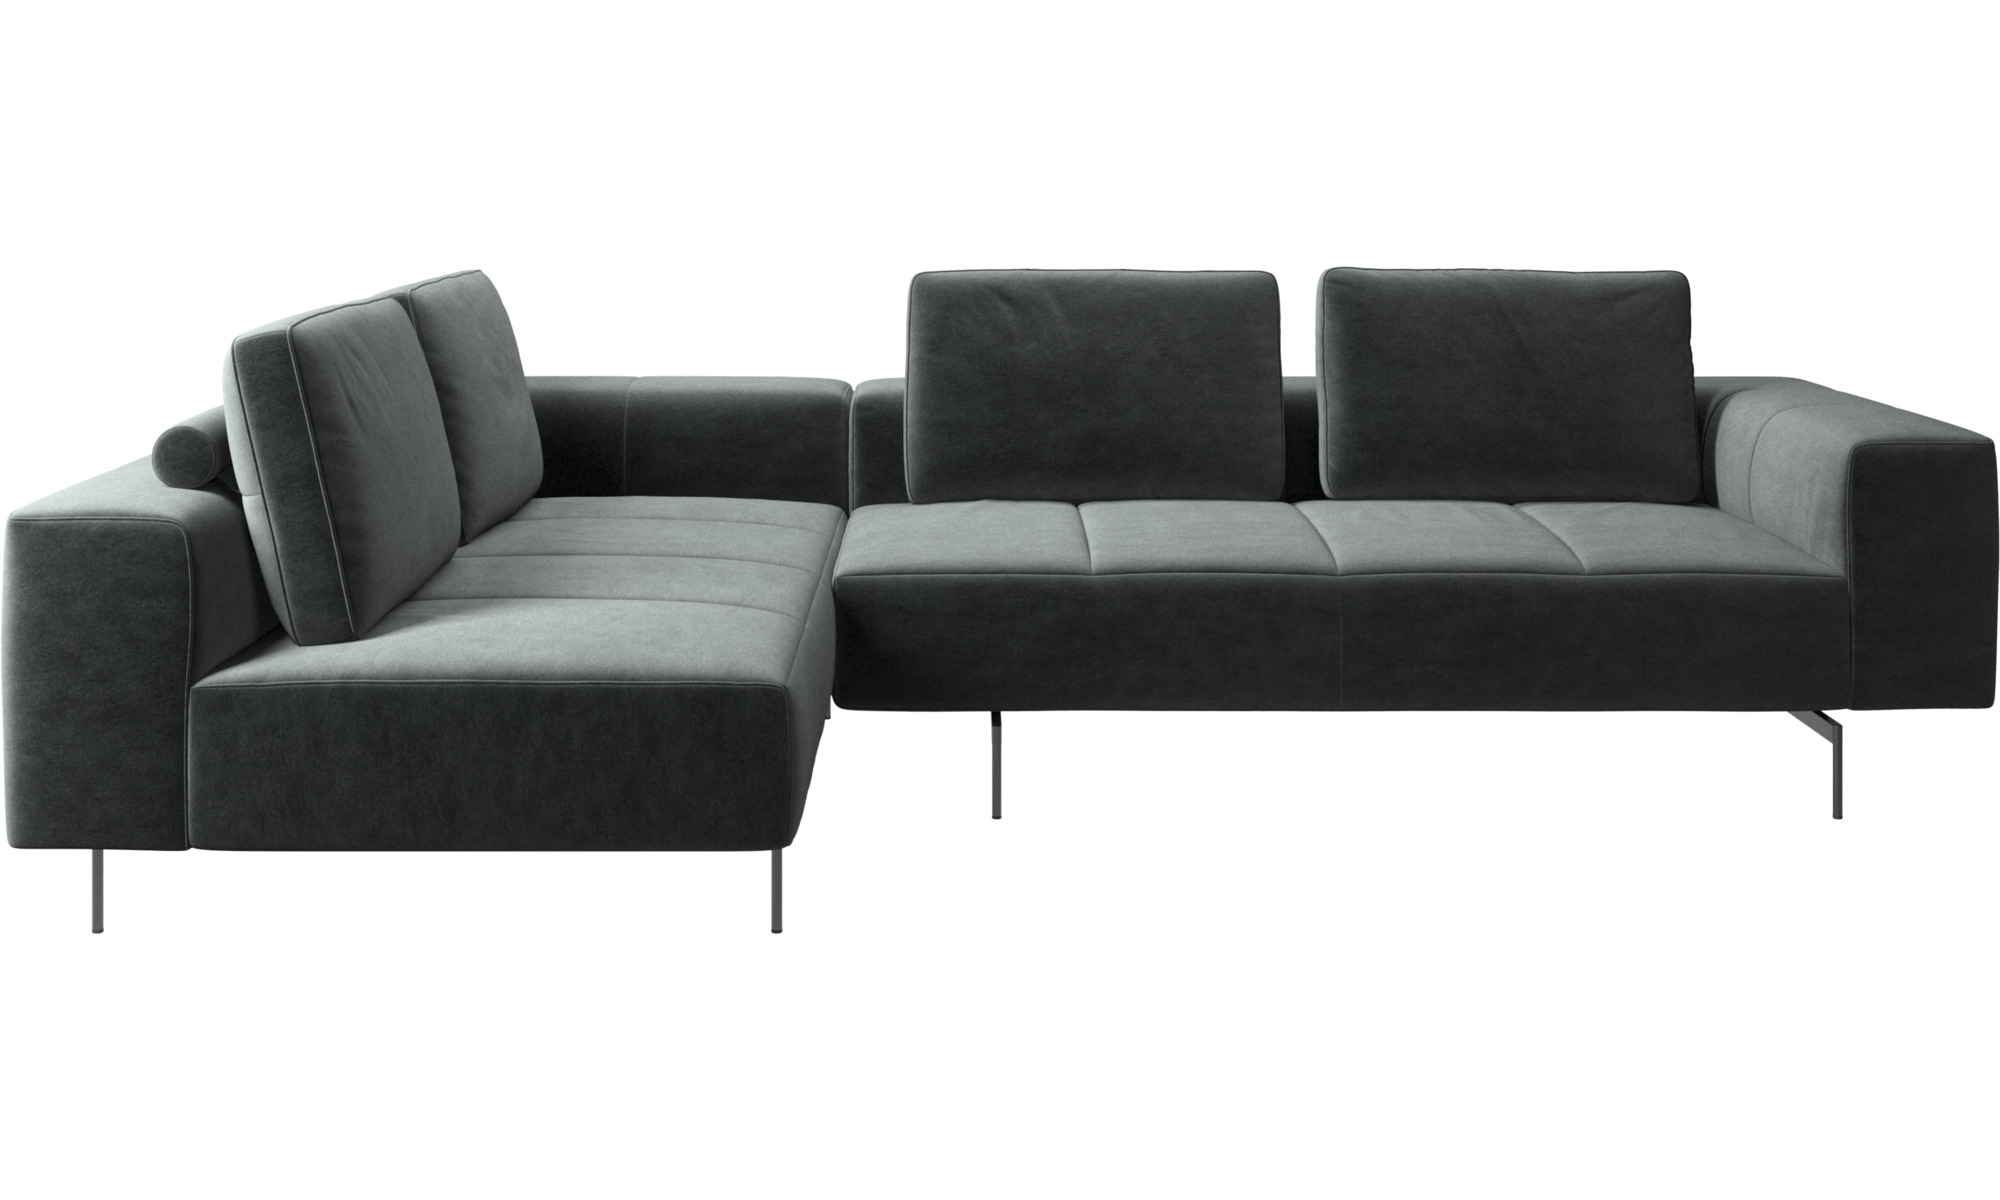 Modular Sofas Amsterdam Corner Sofa